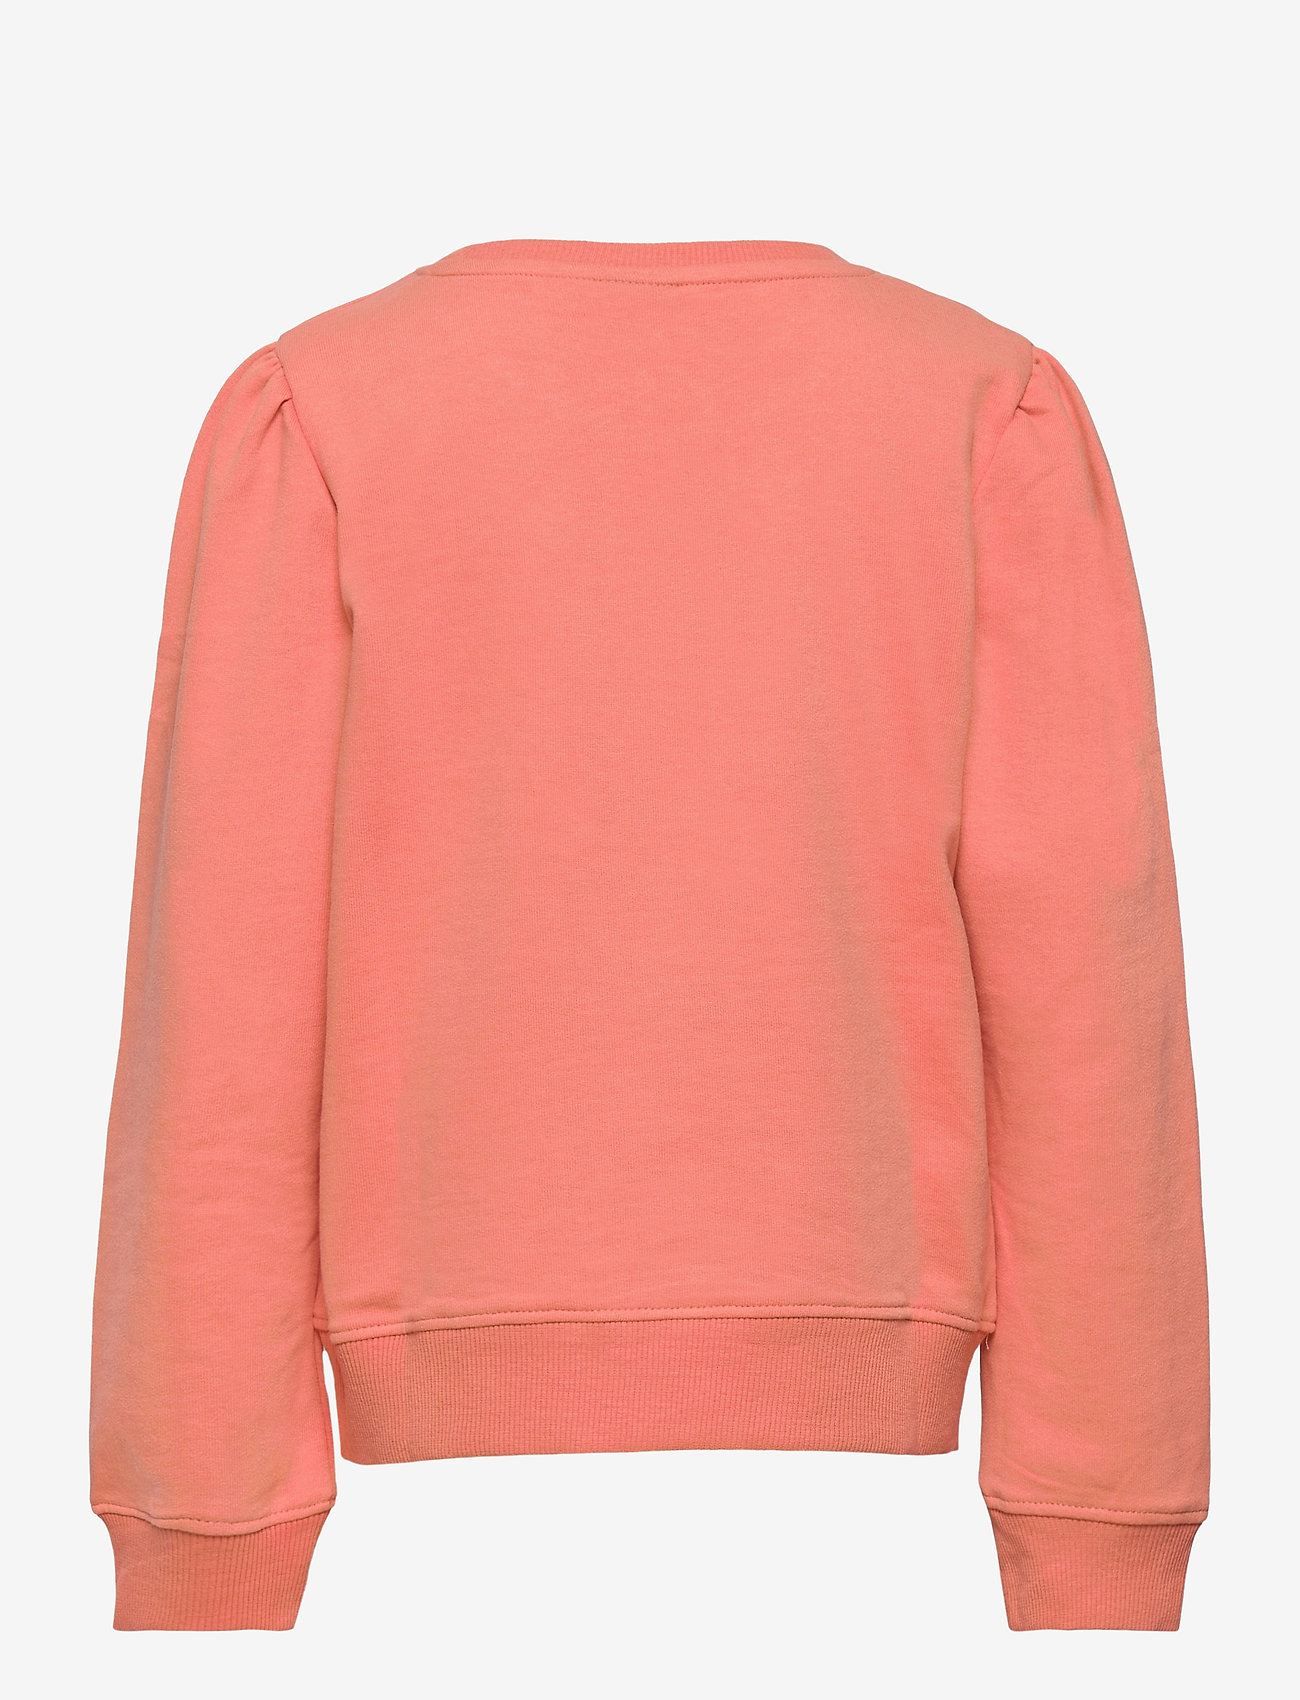 LMTD - NLFFATIAN LS SHORT SWEAT - sweatshirts - crabapple - 1